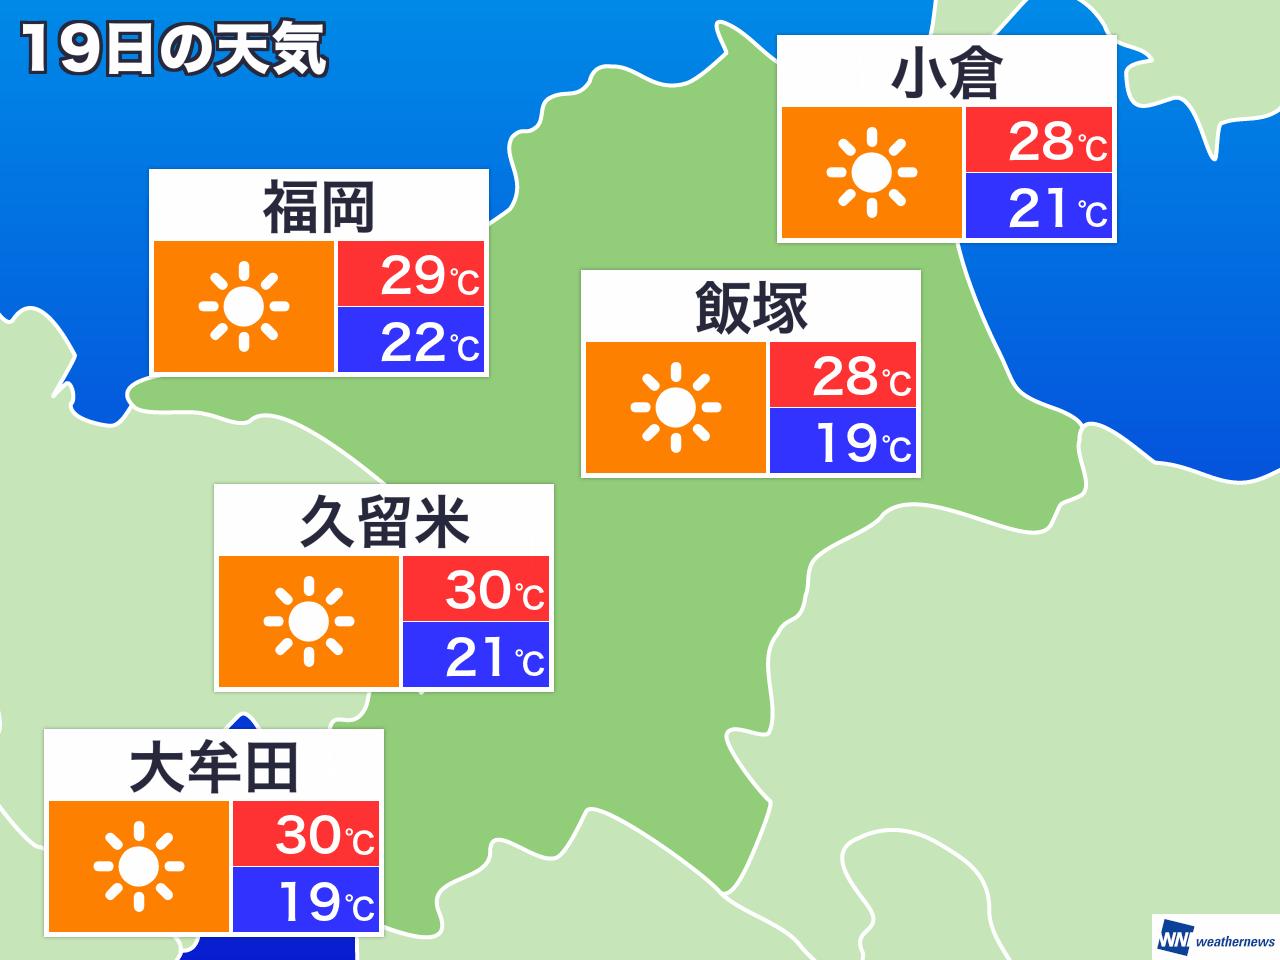 の 市 天気 原市